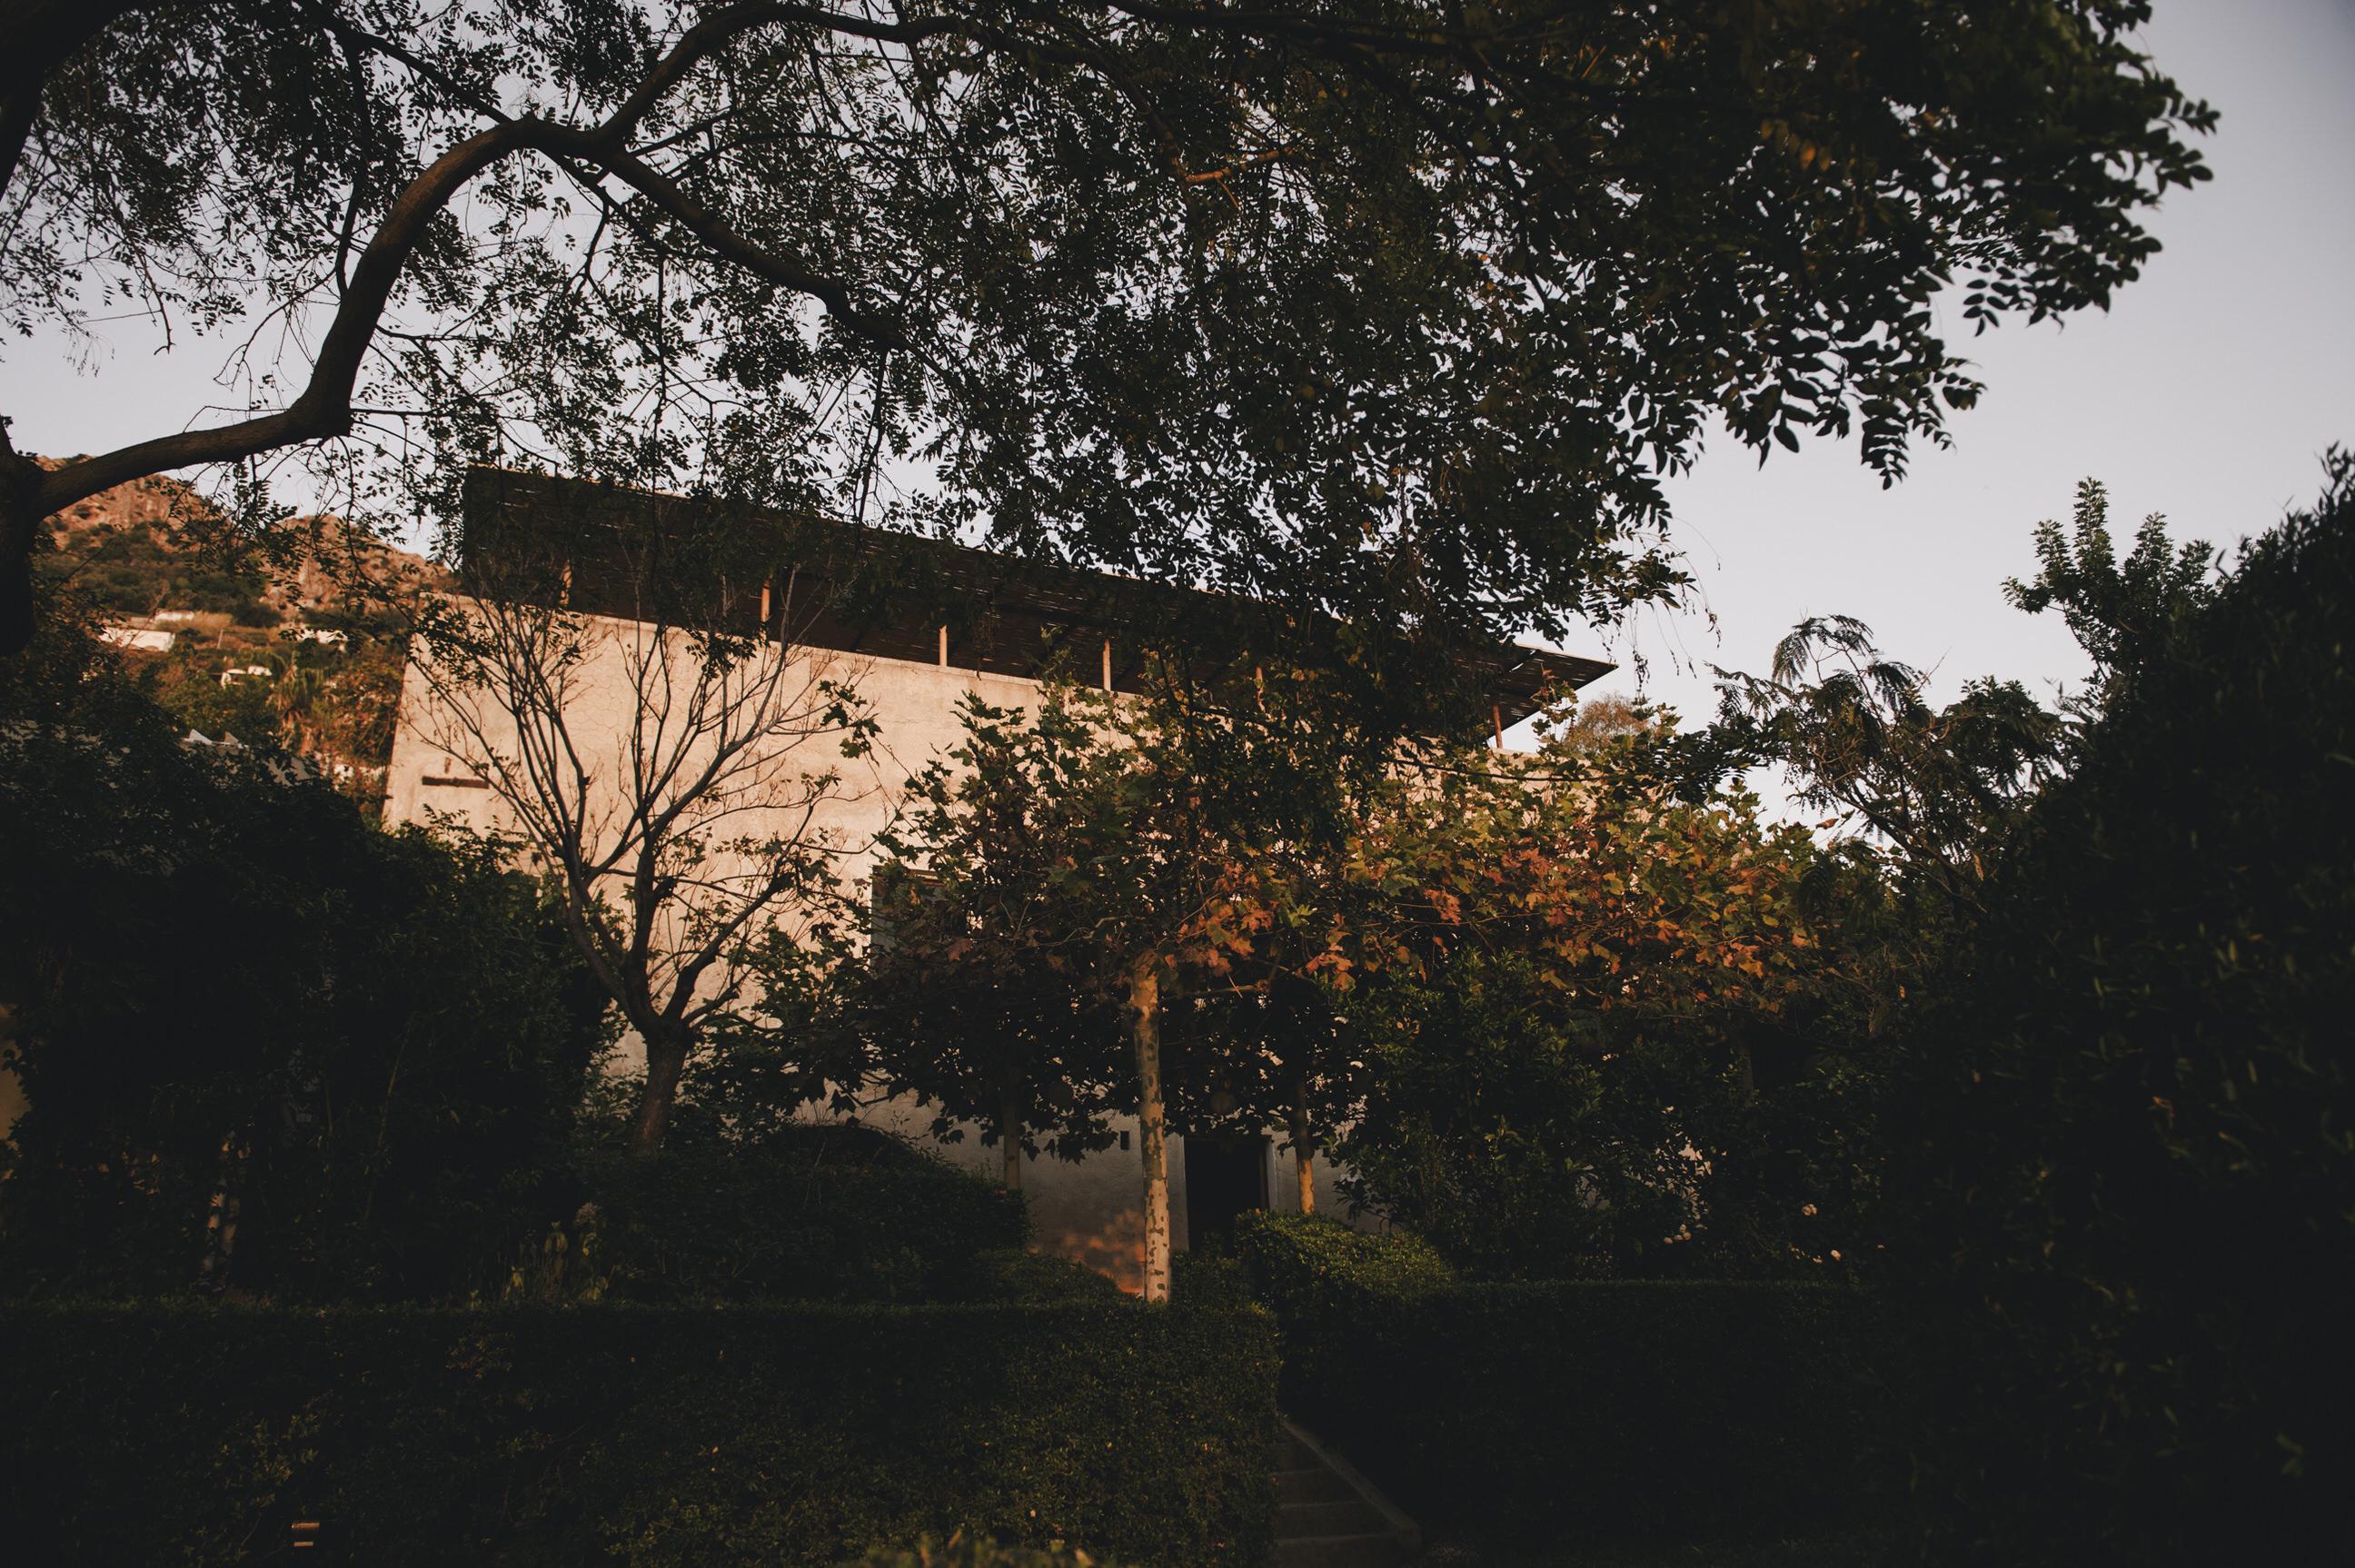 autumn trees and a villa